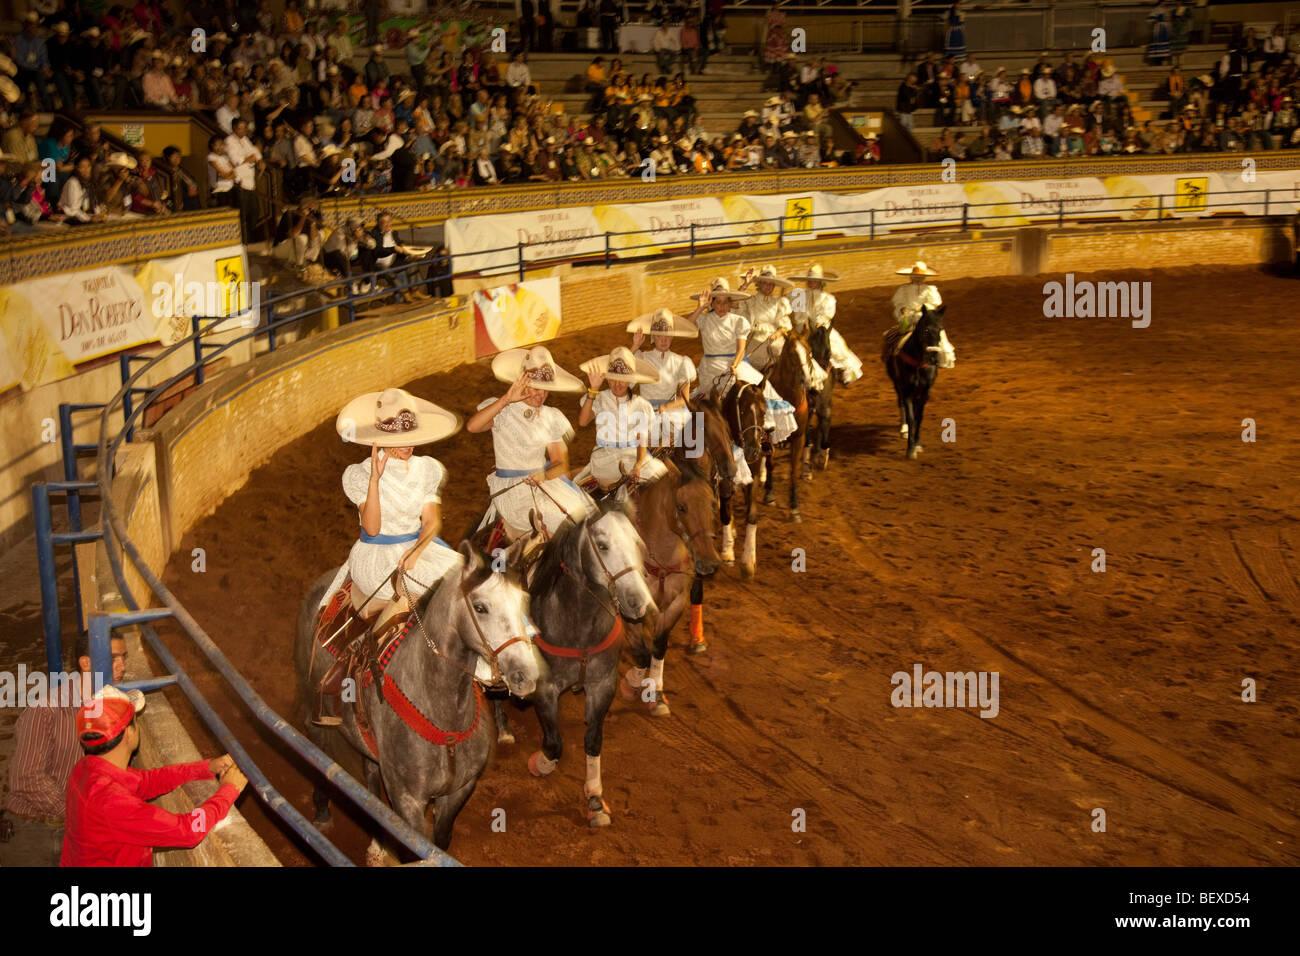 Lienzo Charro, Charreda Show e Fiesta, Guadalajara, Jalisco, Messico Immagini Stock